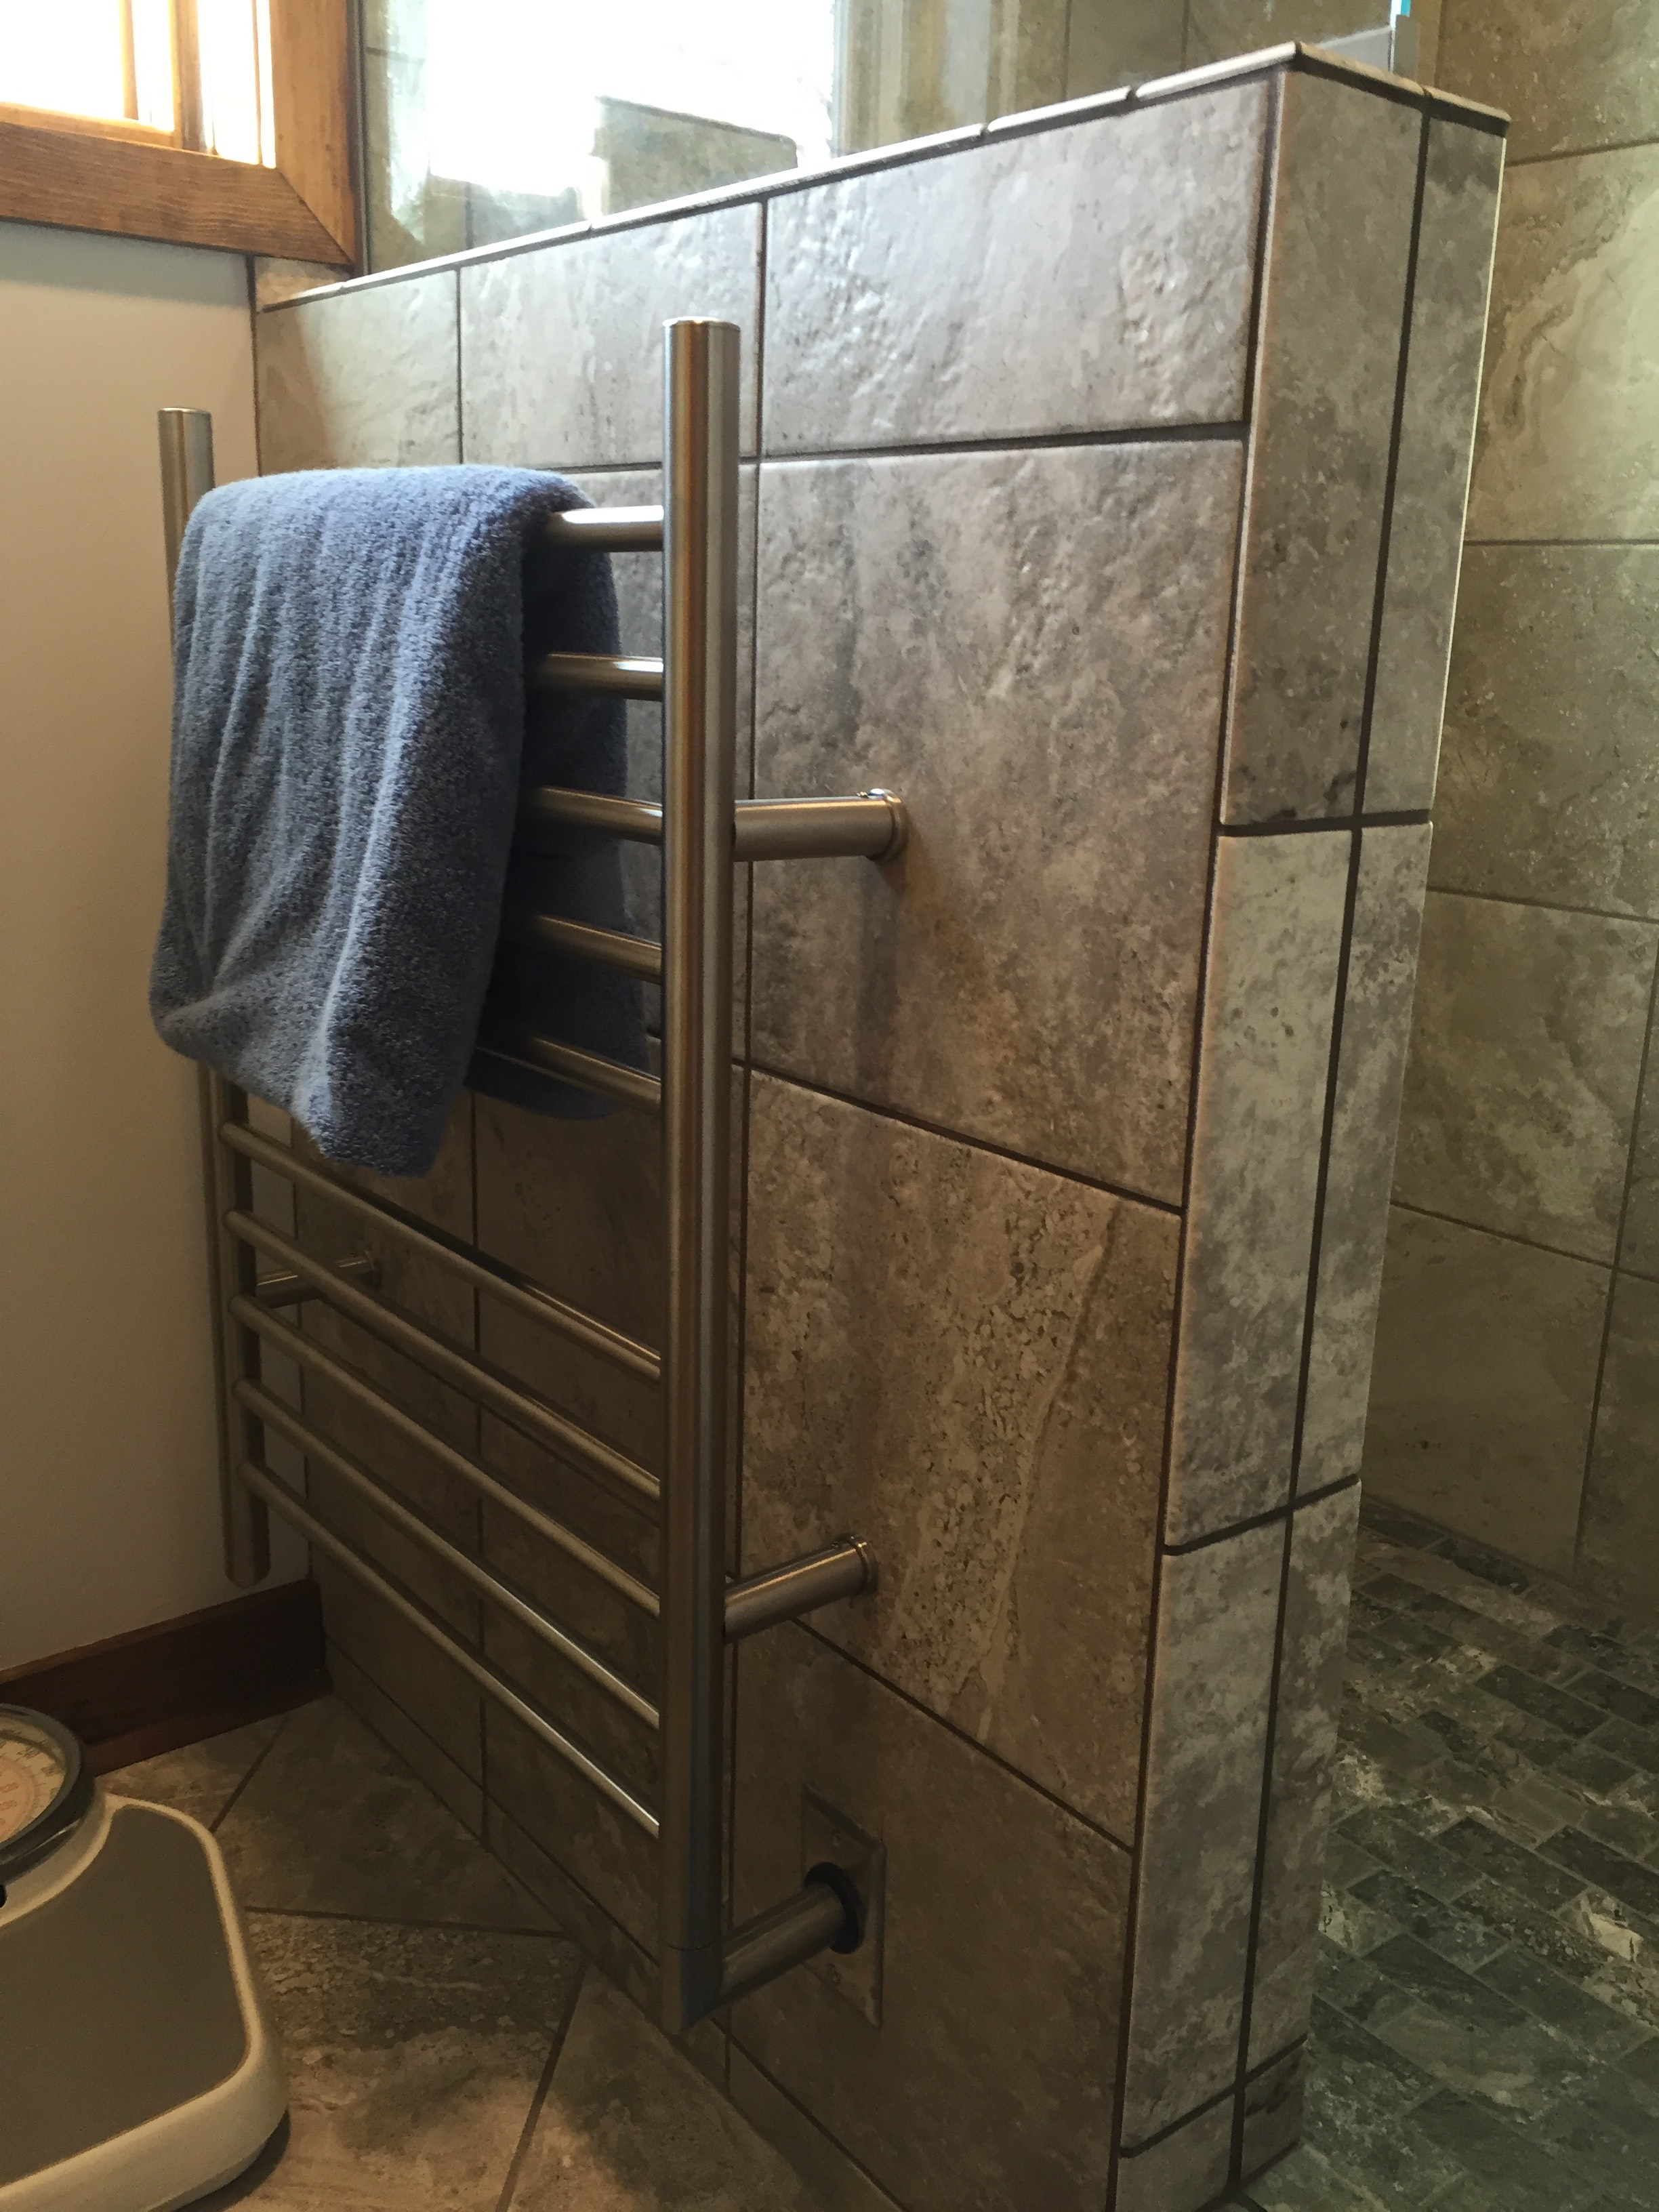 heated towel bar-squashed